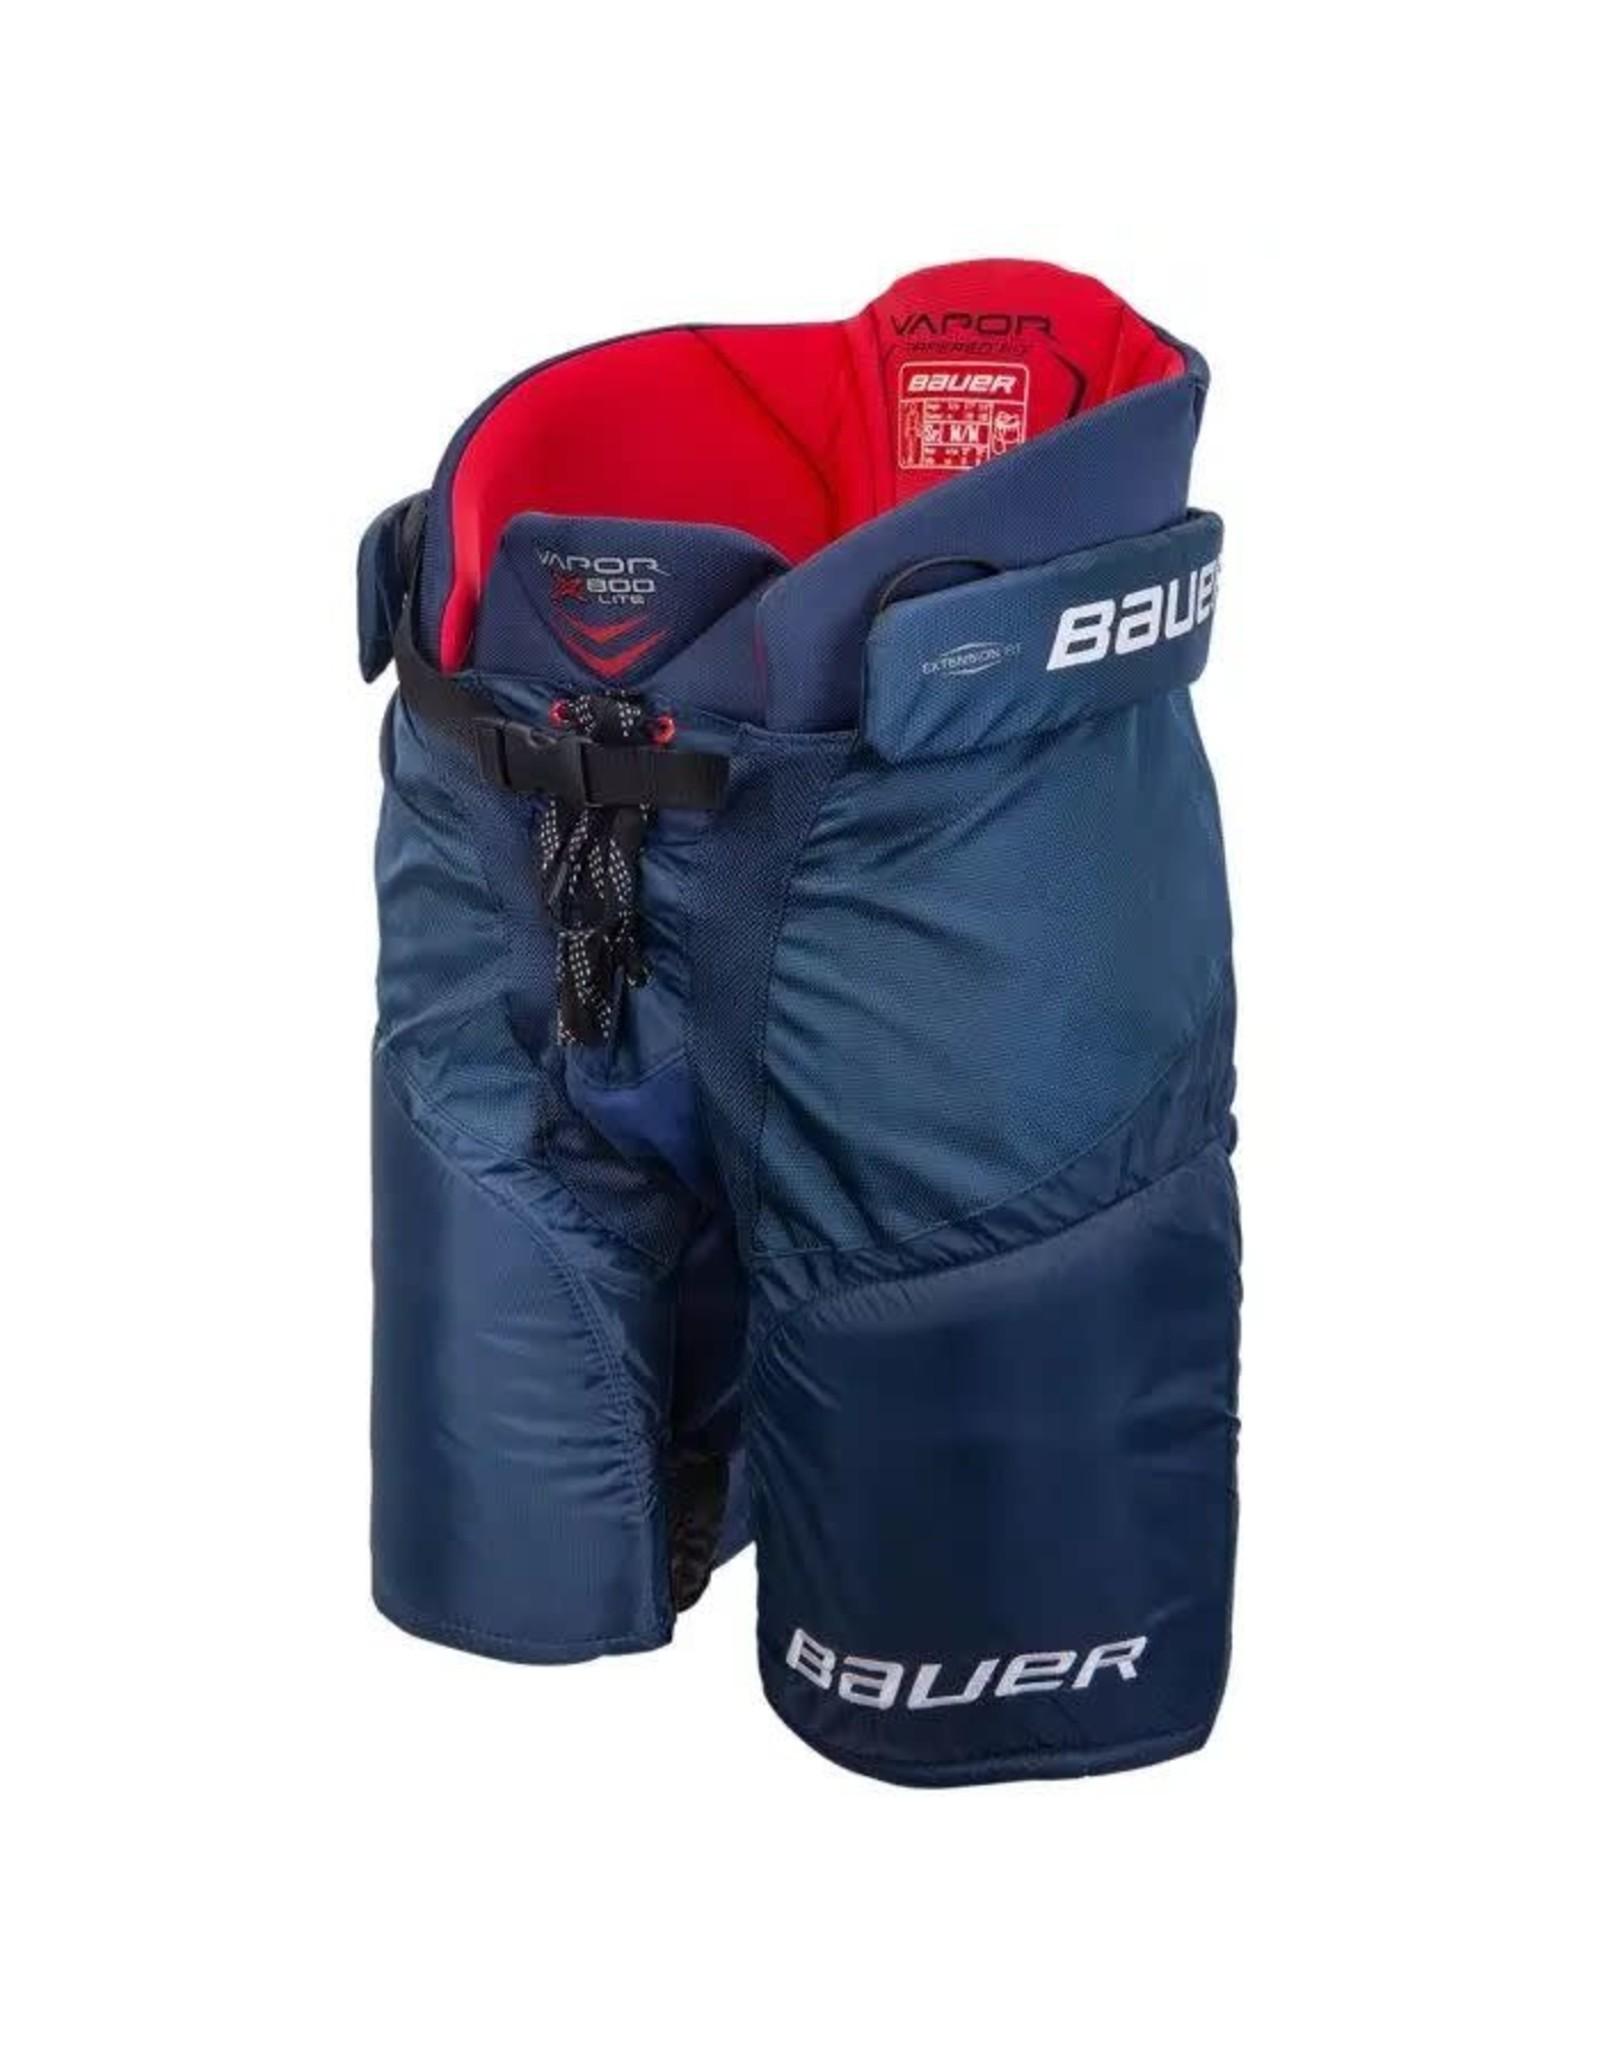 BAUER Pants, Senior, Vapor X800